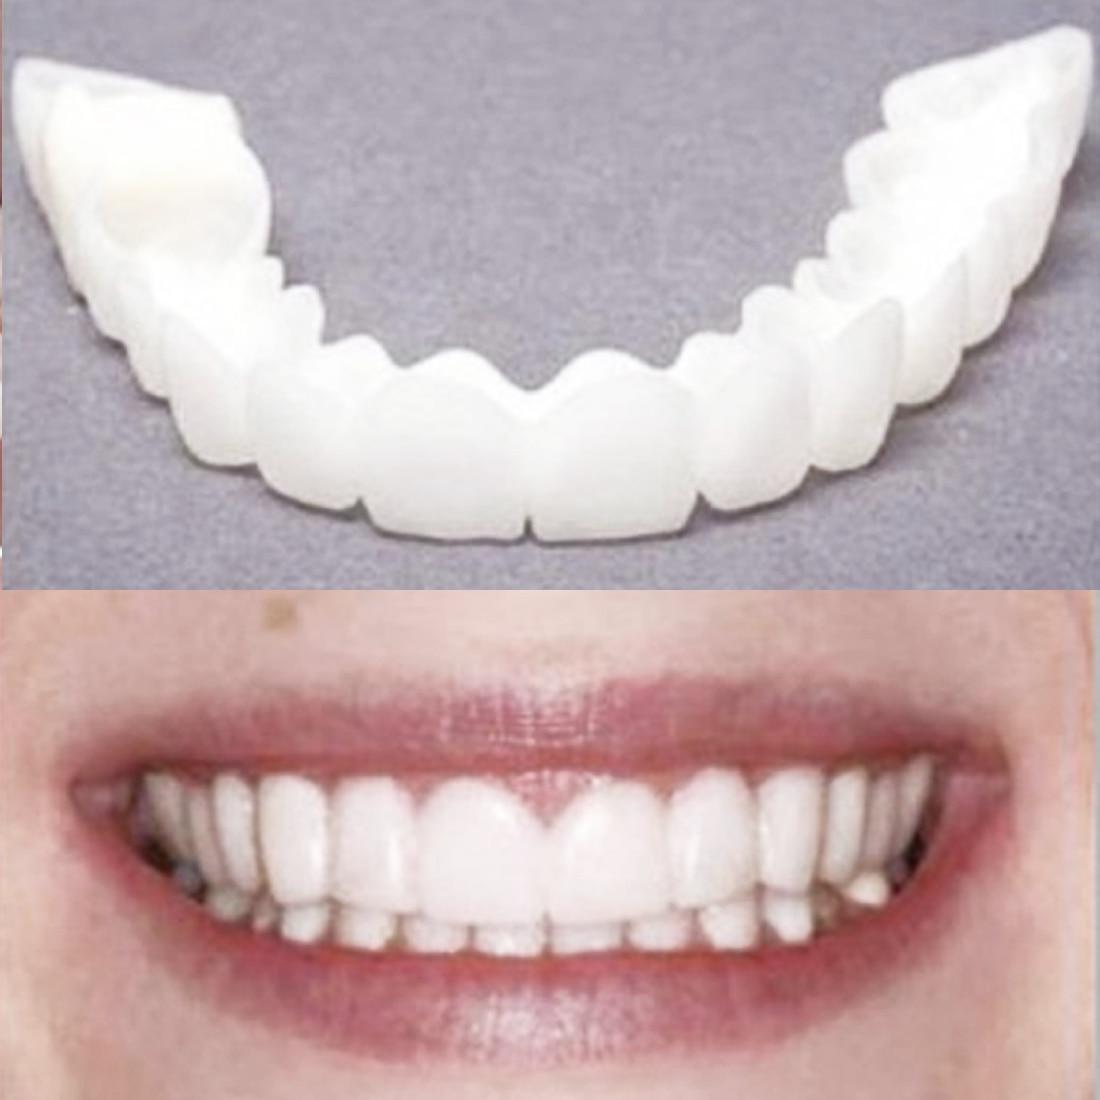 Silicone Perfect Smile Veneers Teeth Upper Beauty Tool Teeth for Men Women Natural Cosmetic Fake Tooth Cover Orthodontics tool serveware